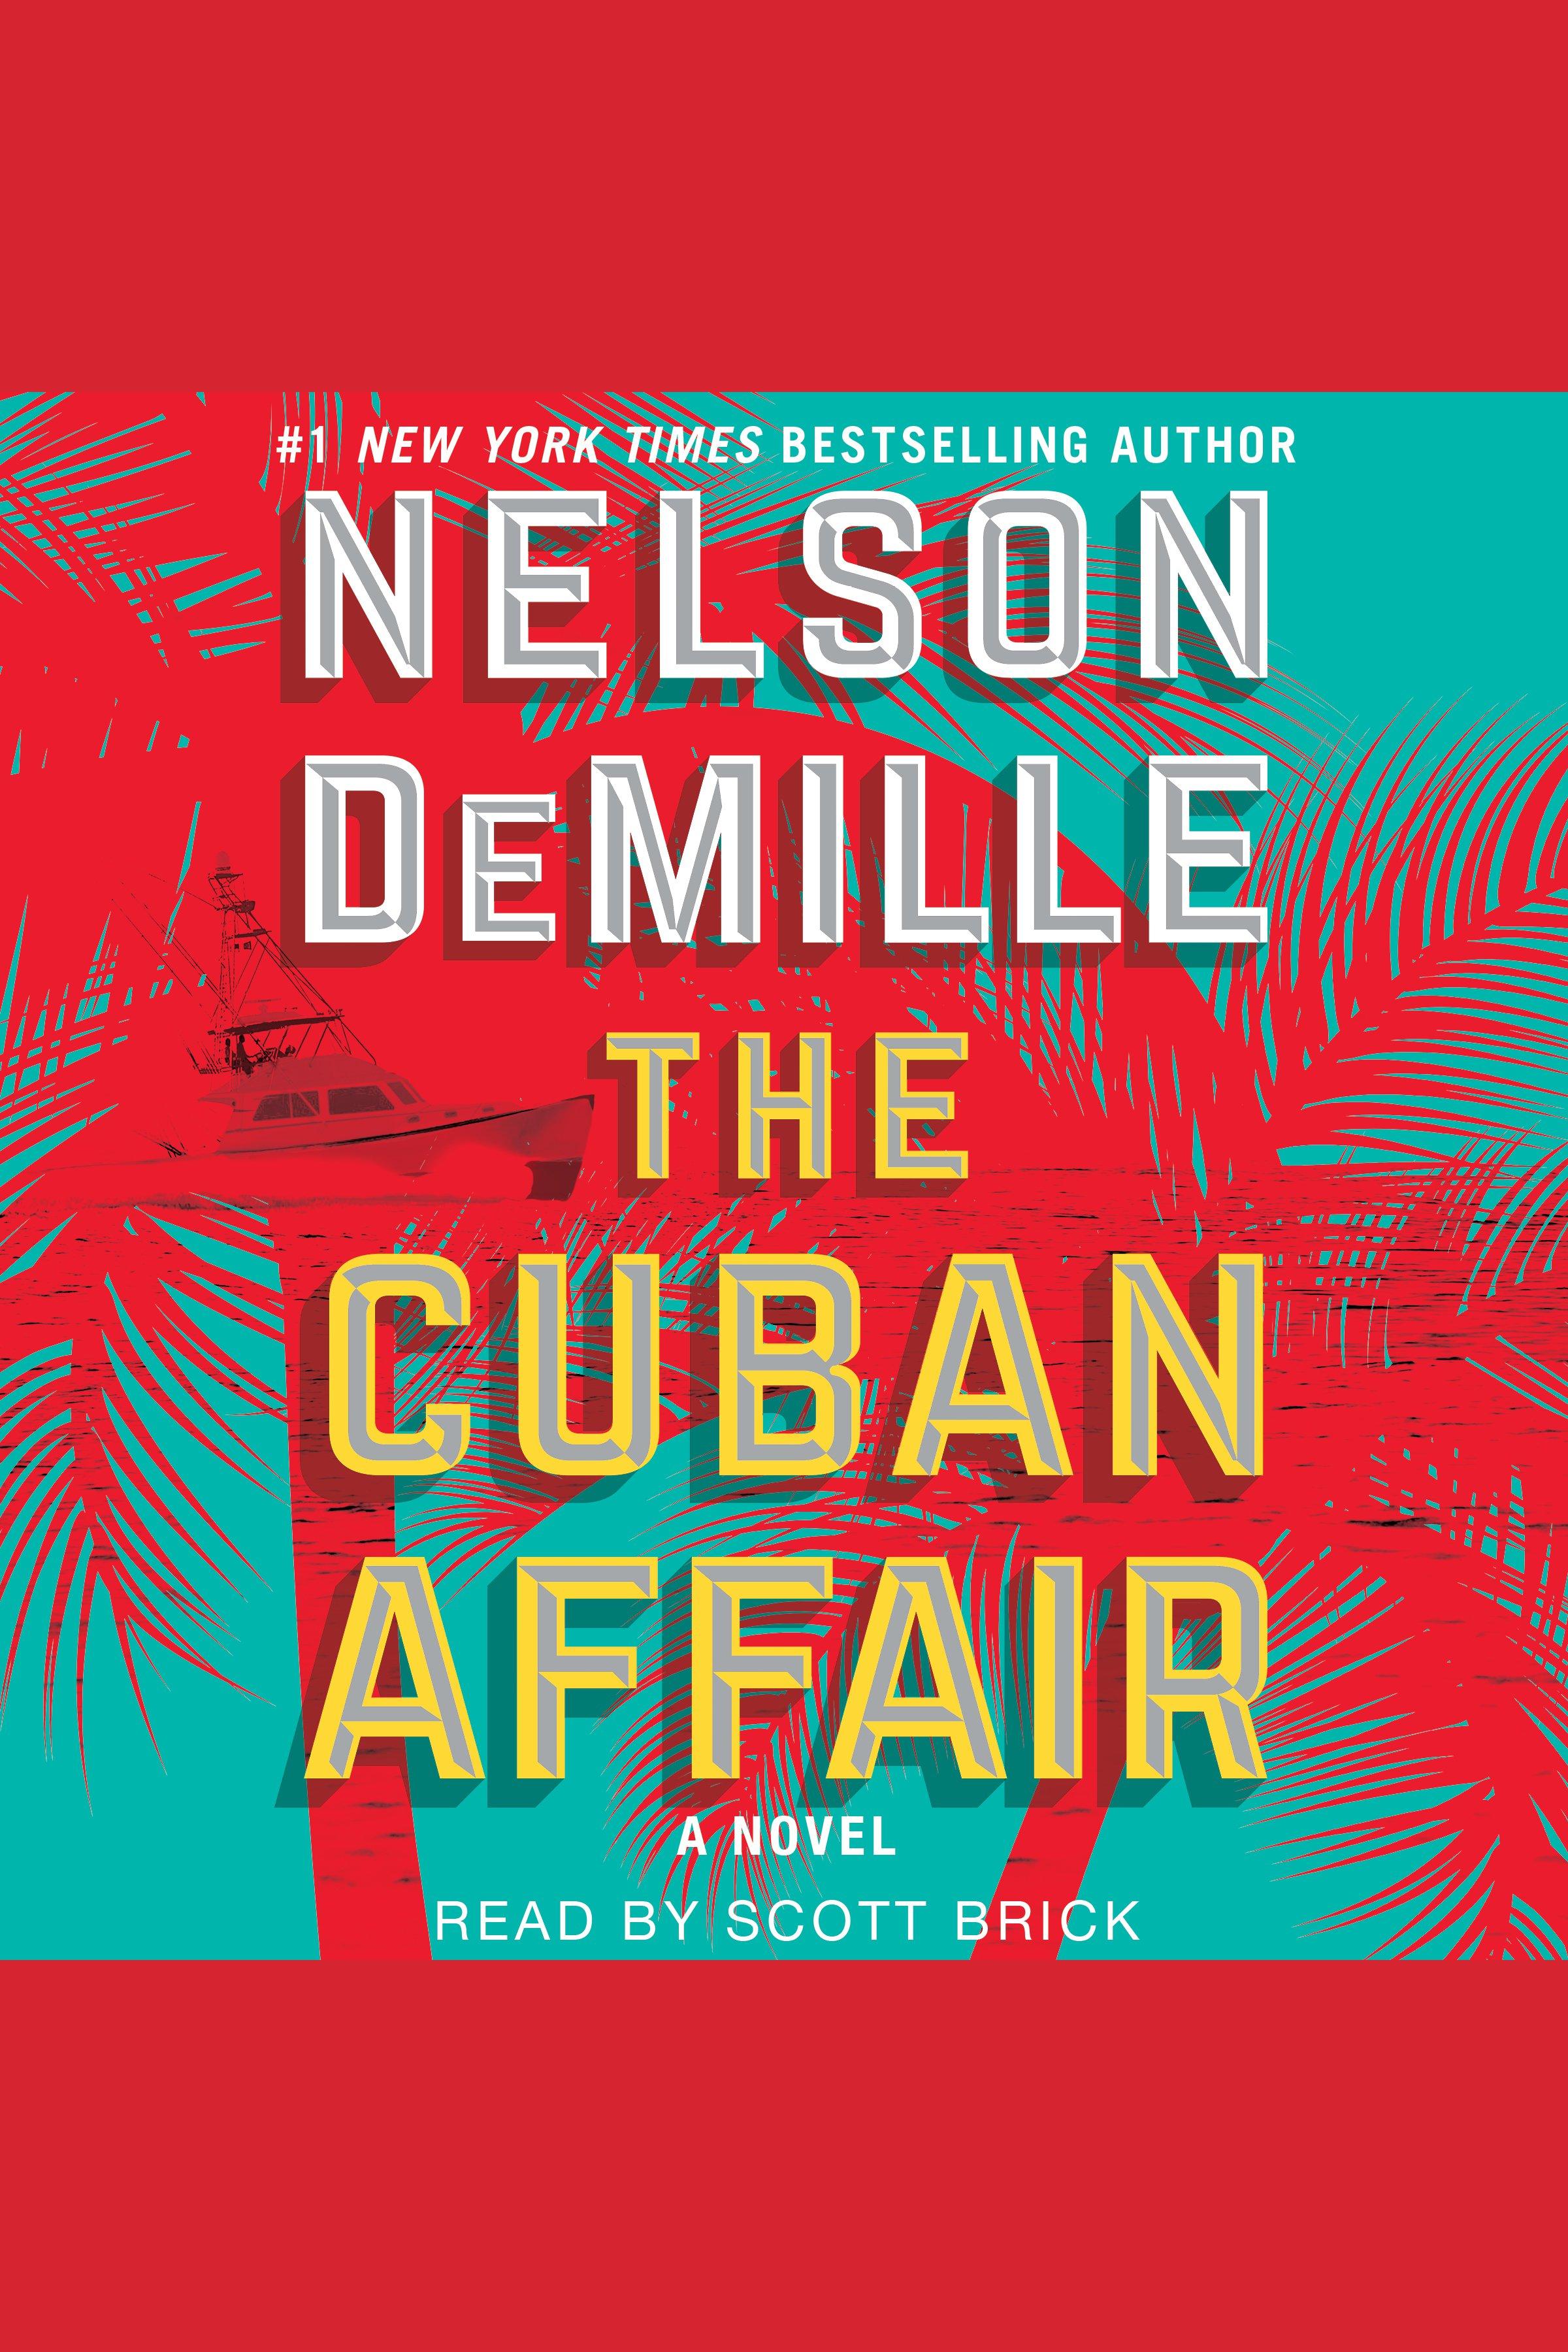 The Cuban affair cover image